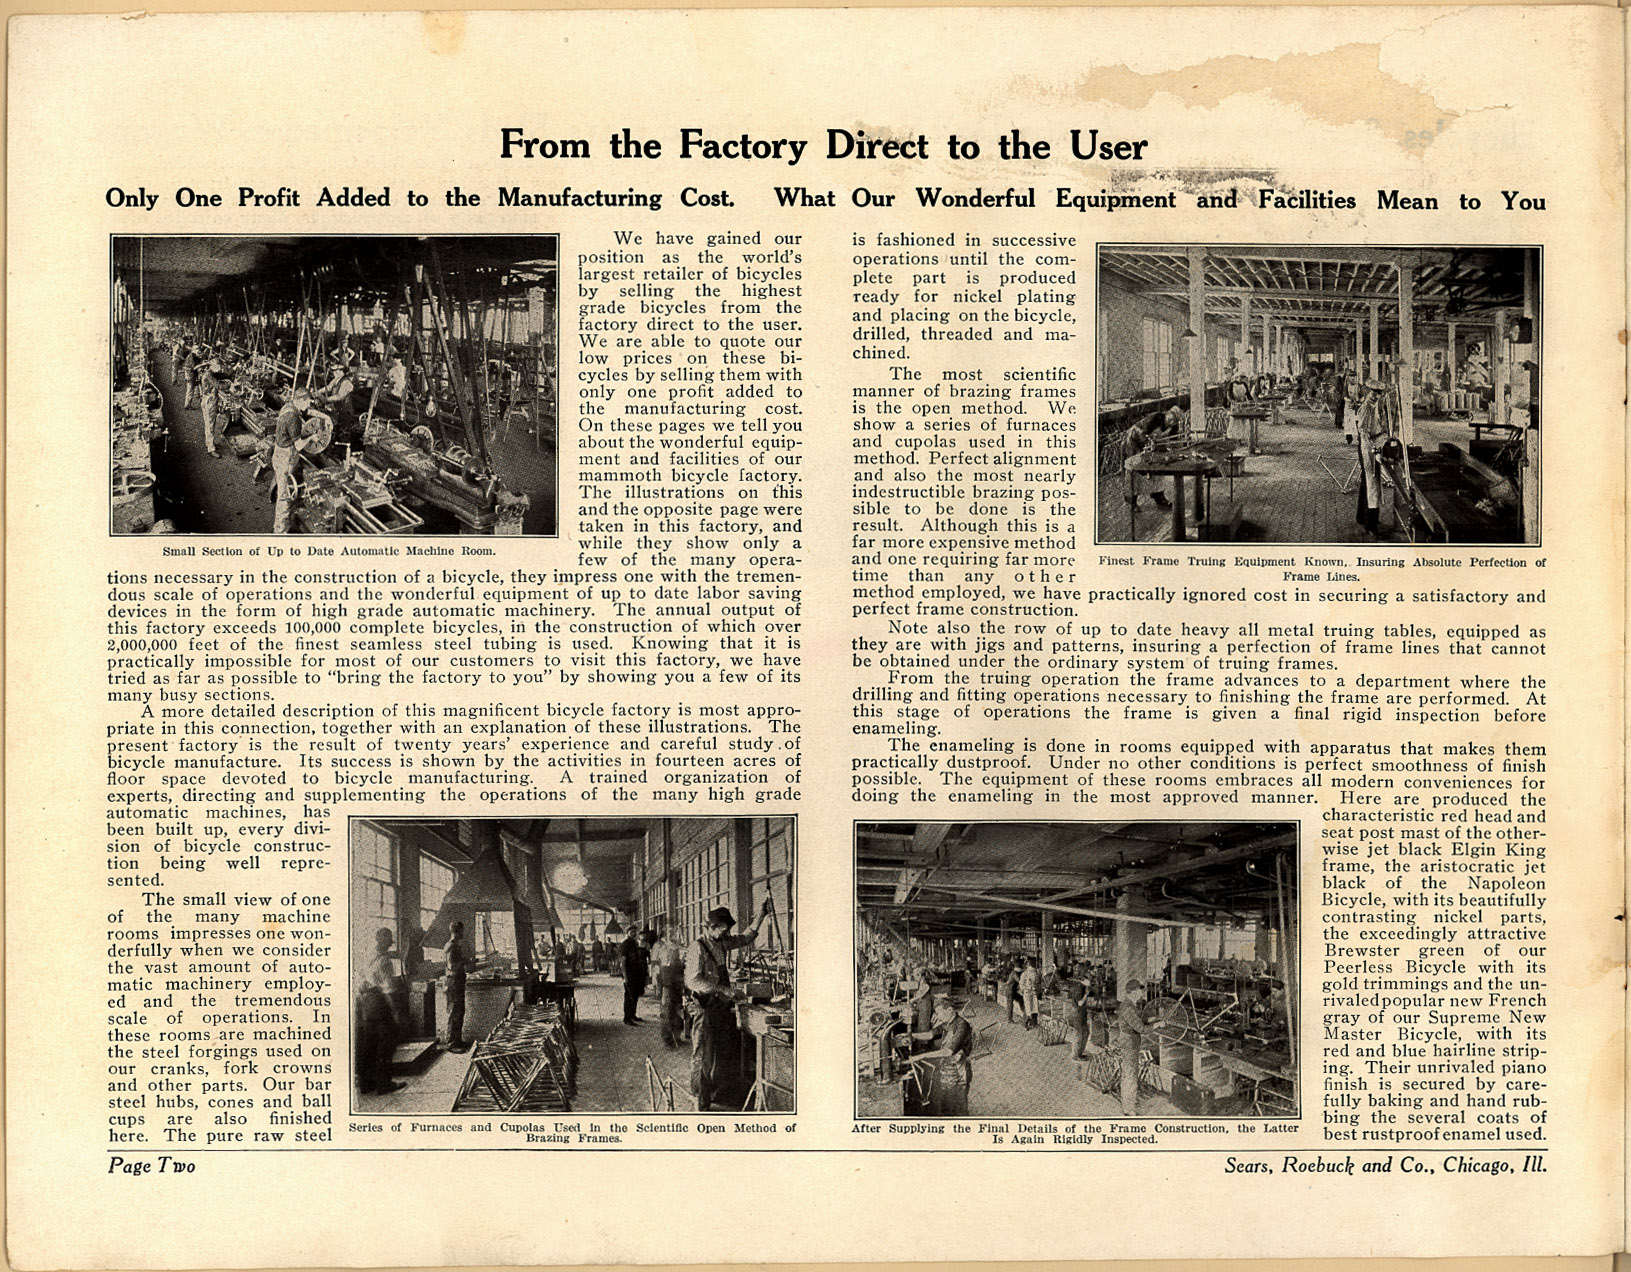 Sears, Roebuck & Co., 1914